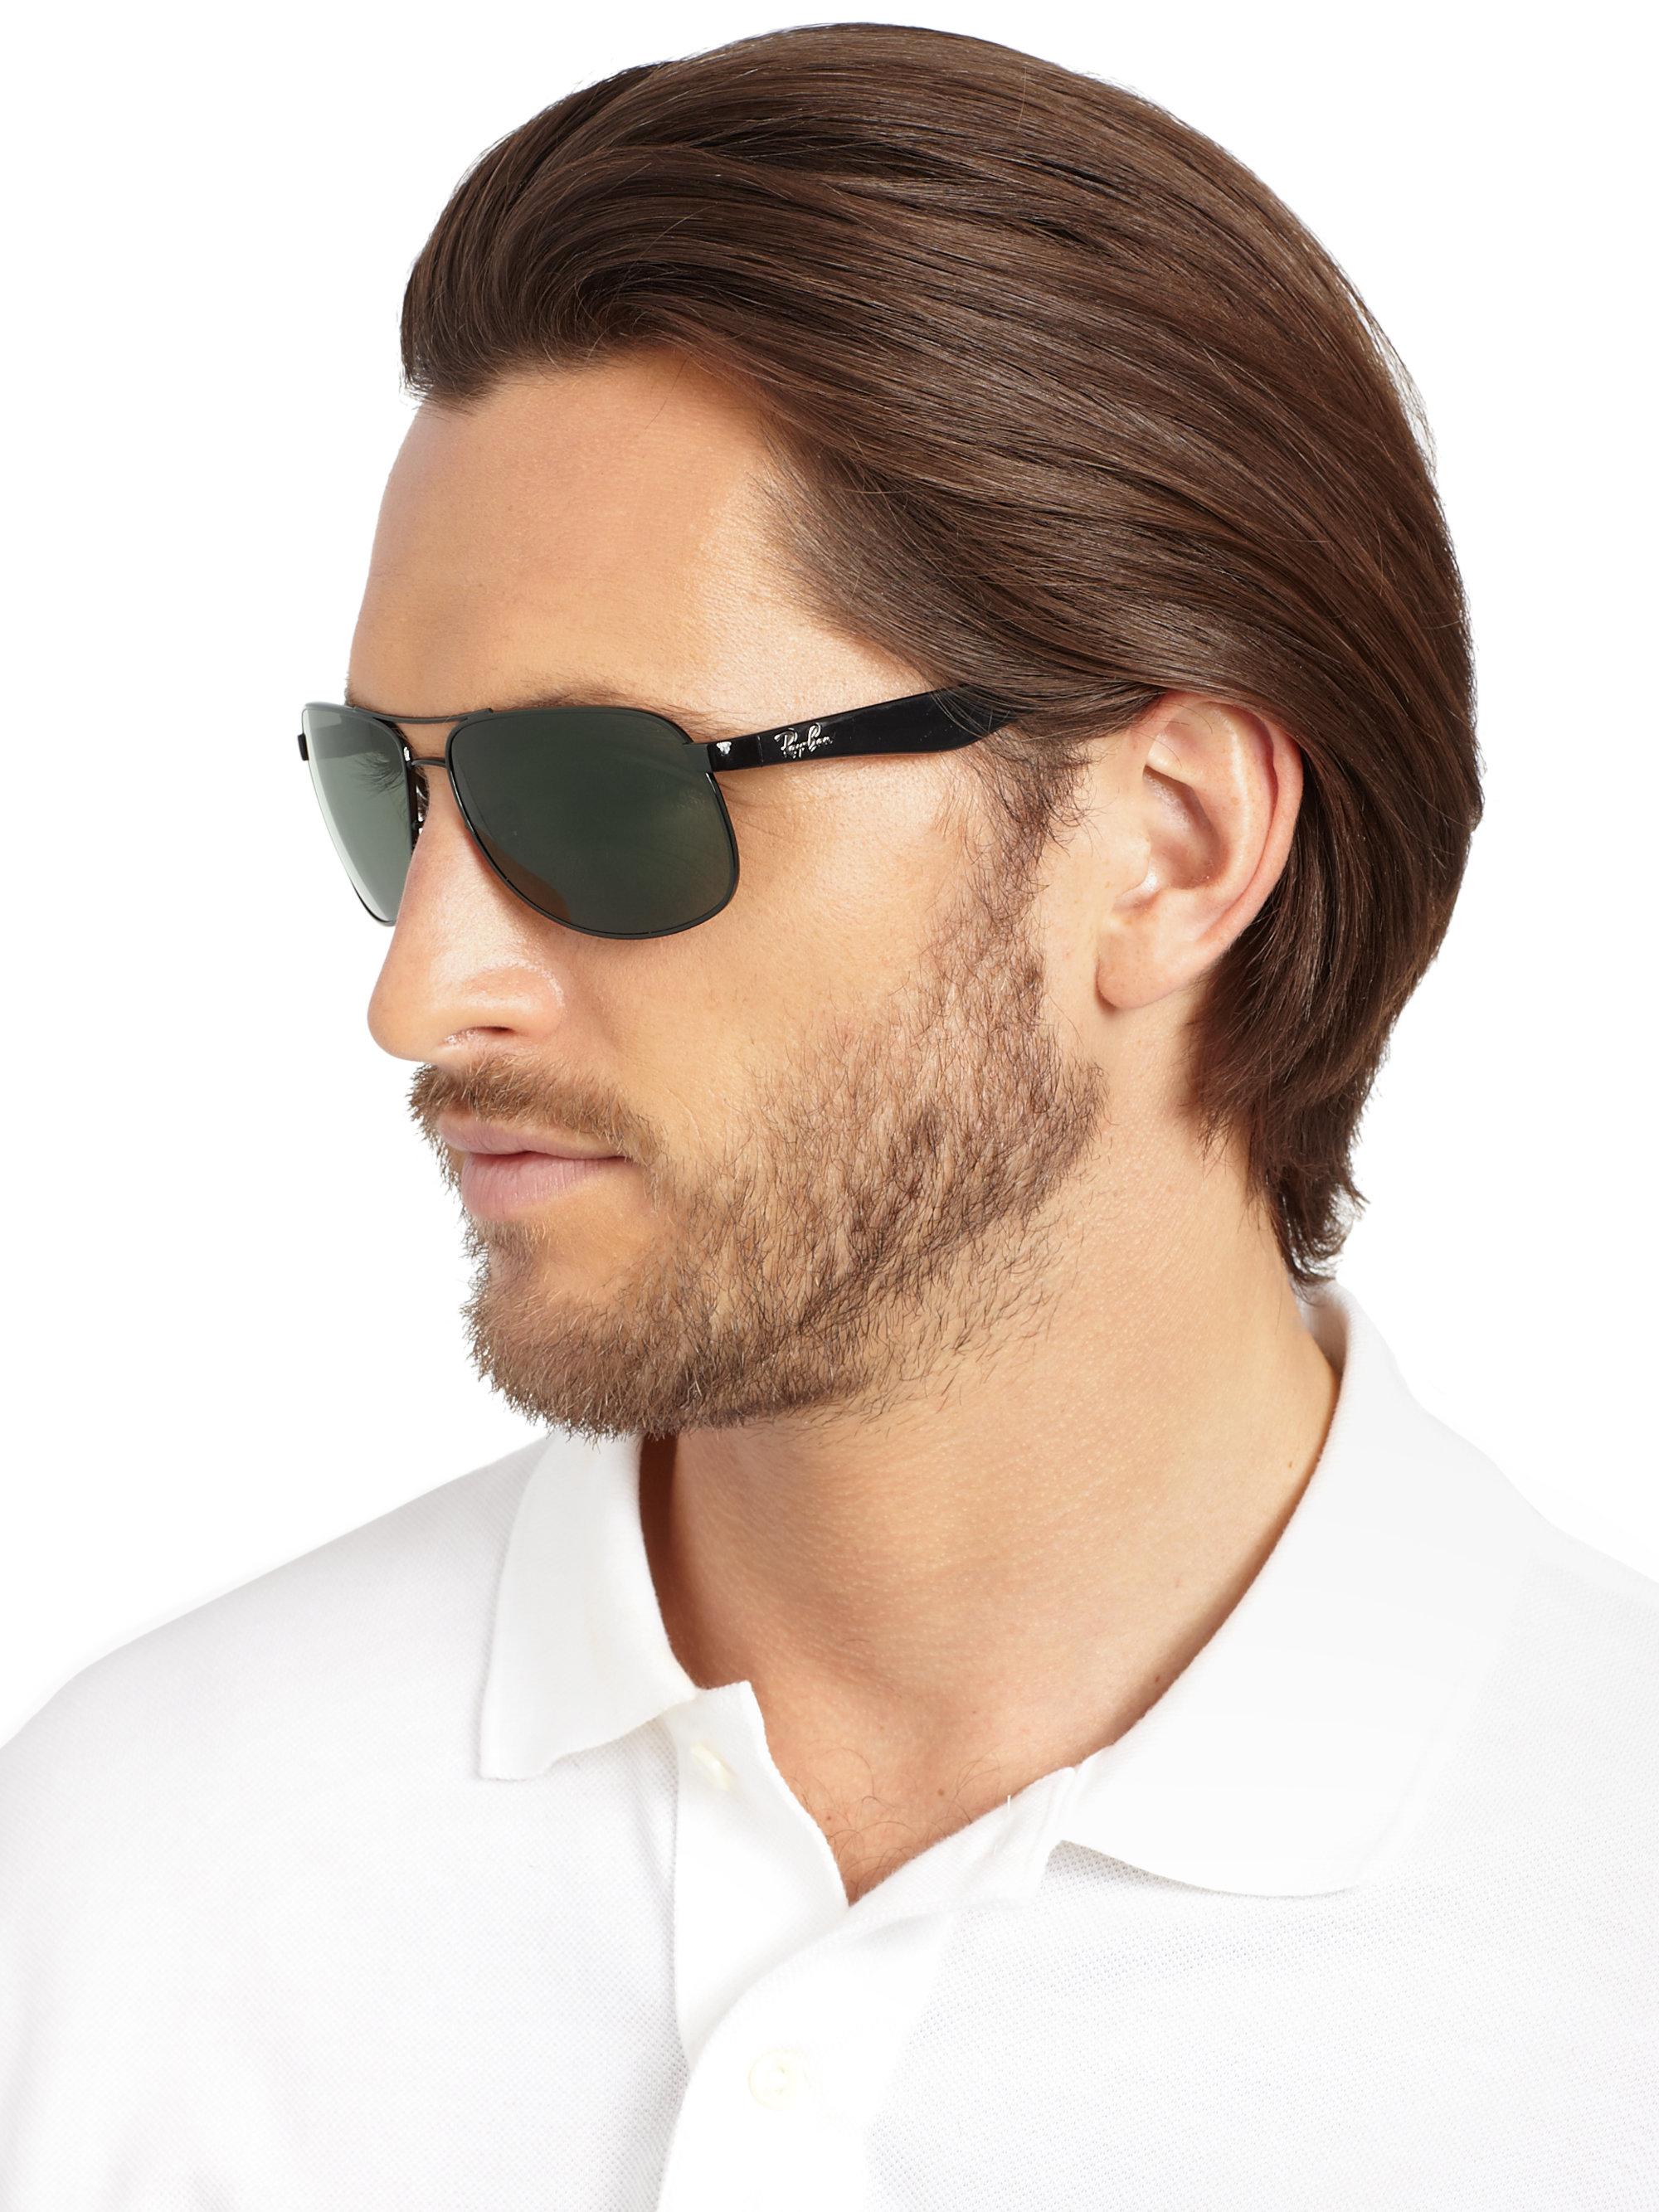 6499349fd7 Lyst - Ray-Ban Highstreet 61mm Pilot Sunglasses in Black for Men